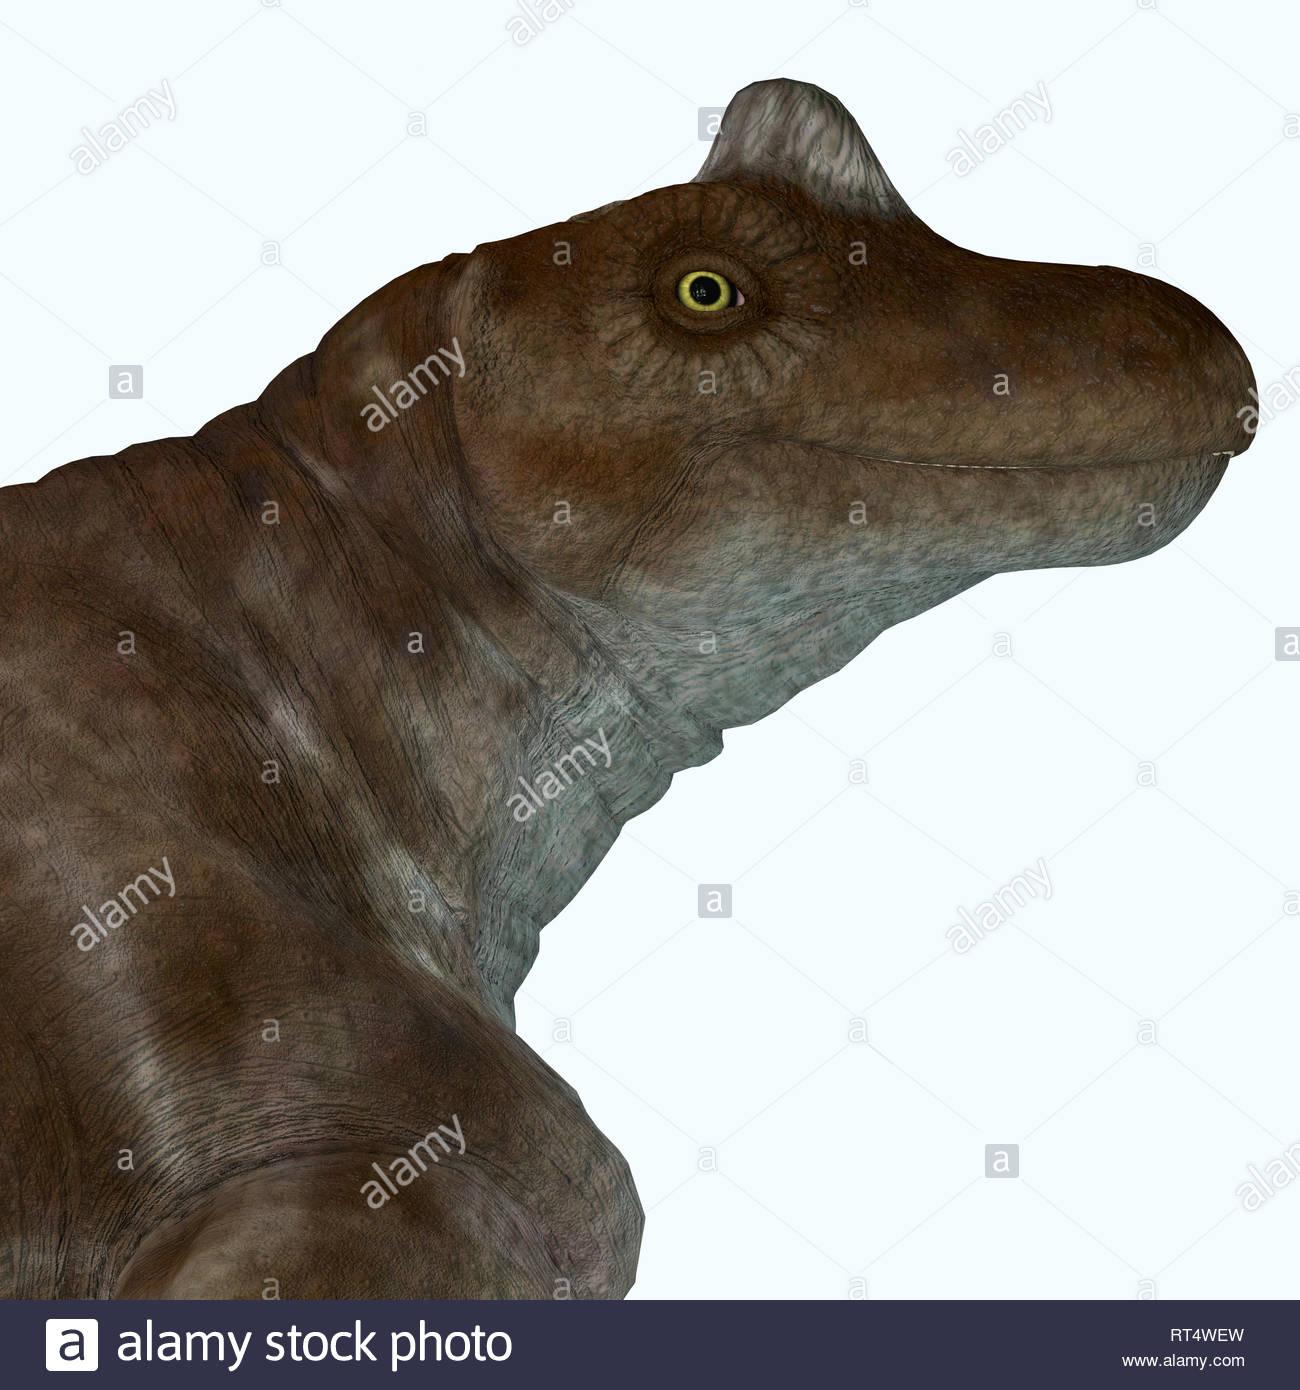 Keratocephalus dinosaur portrait. - Stock Image